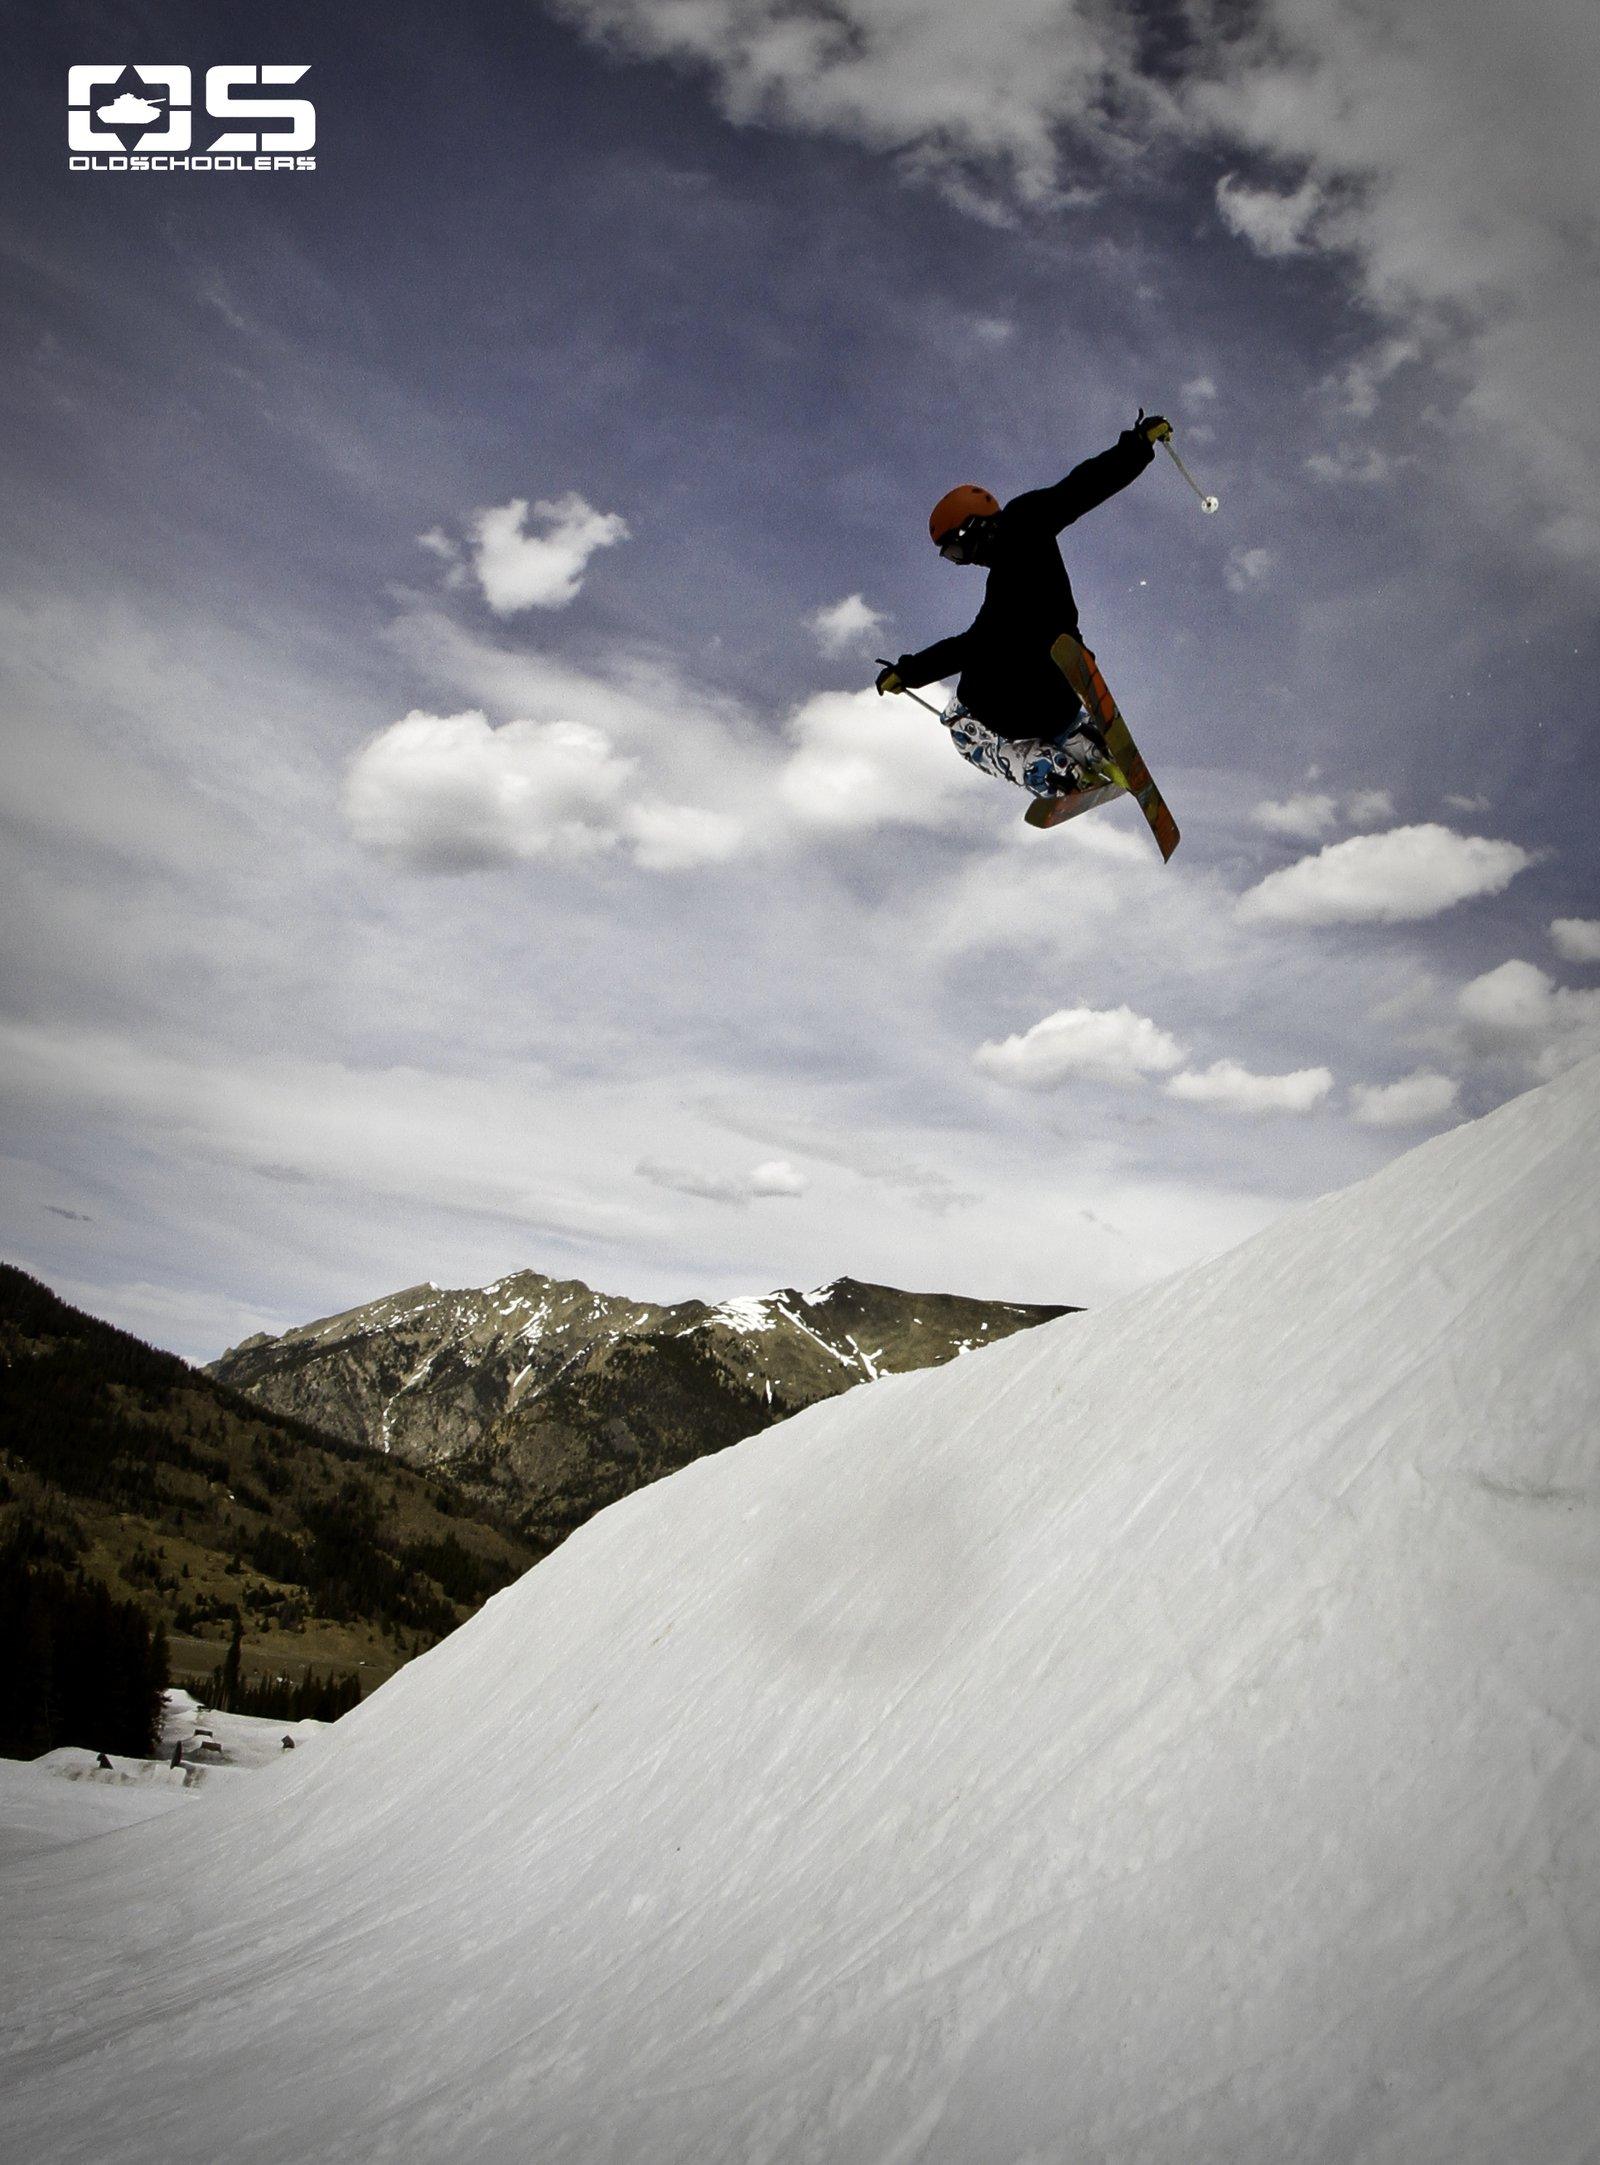 Airin hip at nationals in Colorado